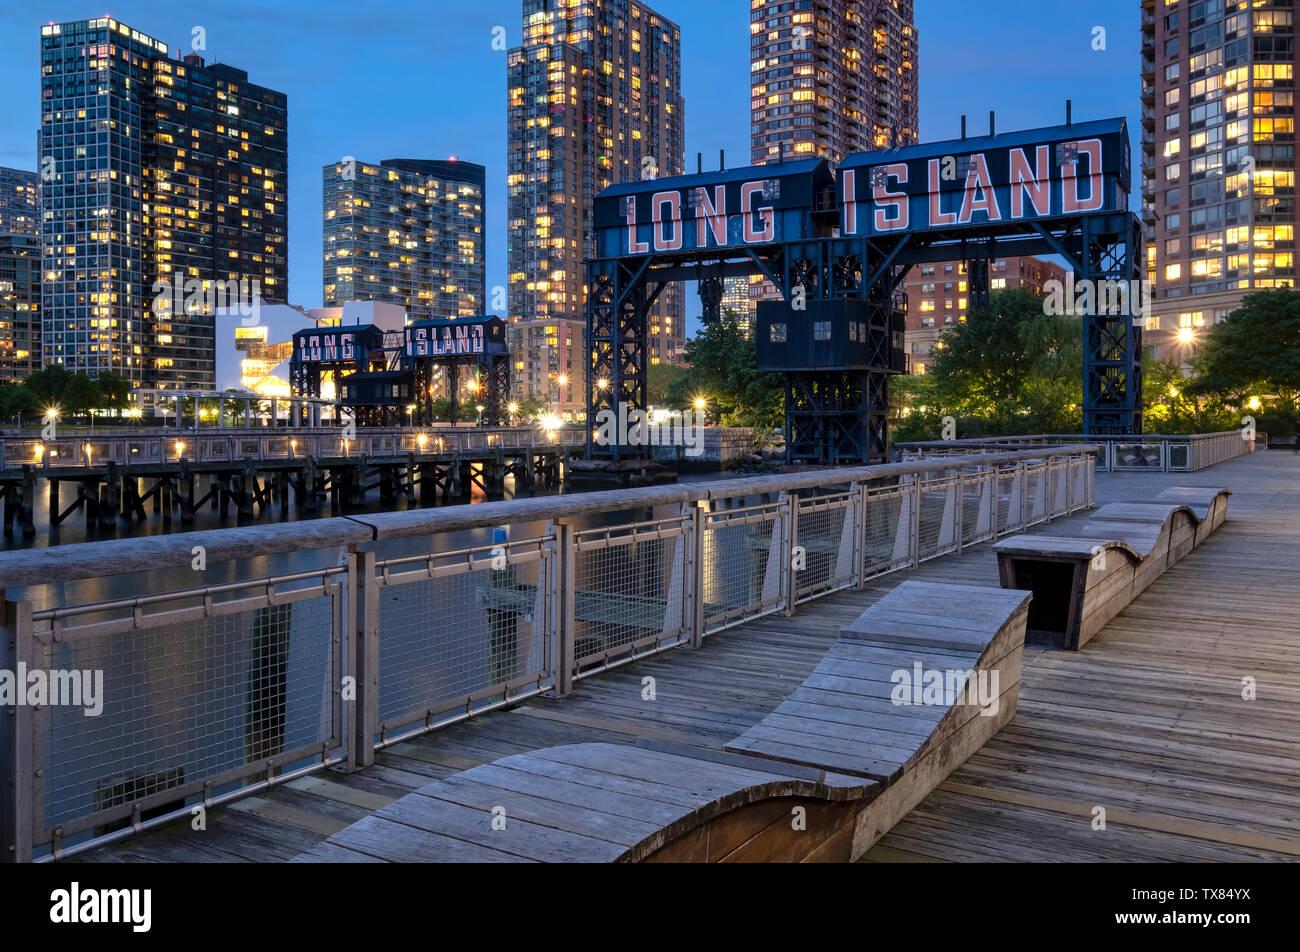 Gantry Plaza State Park at night with Long Island restored Gantries, Long Island City, New York, USA Stock Photo